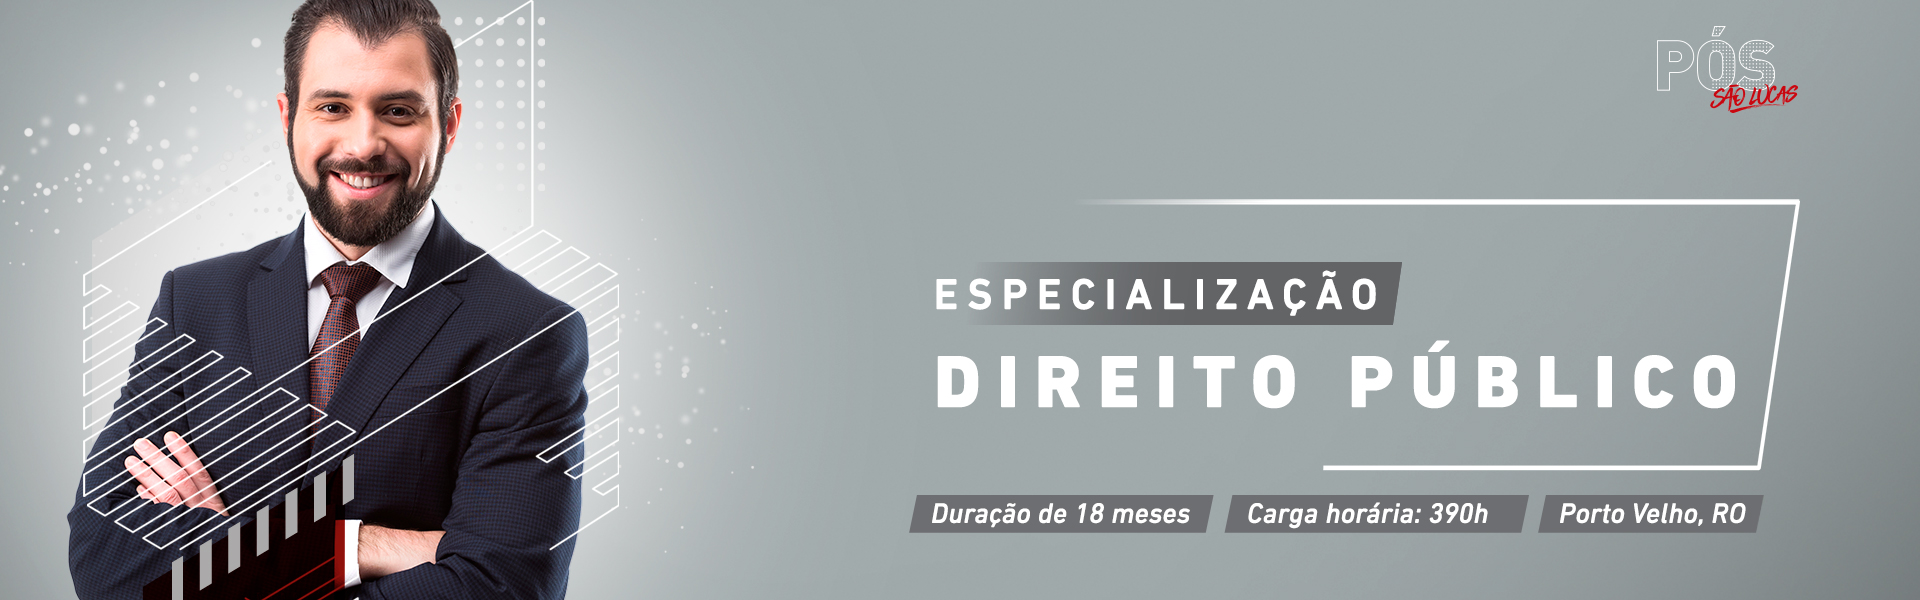 DireitoPublico_Site